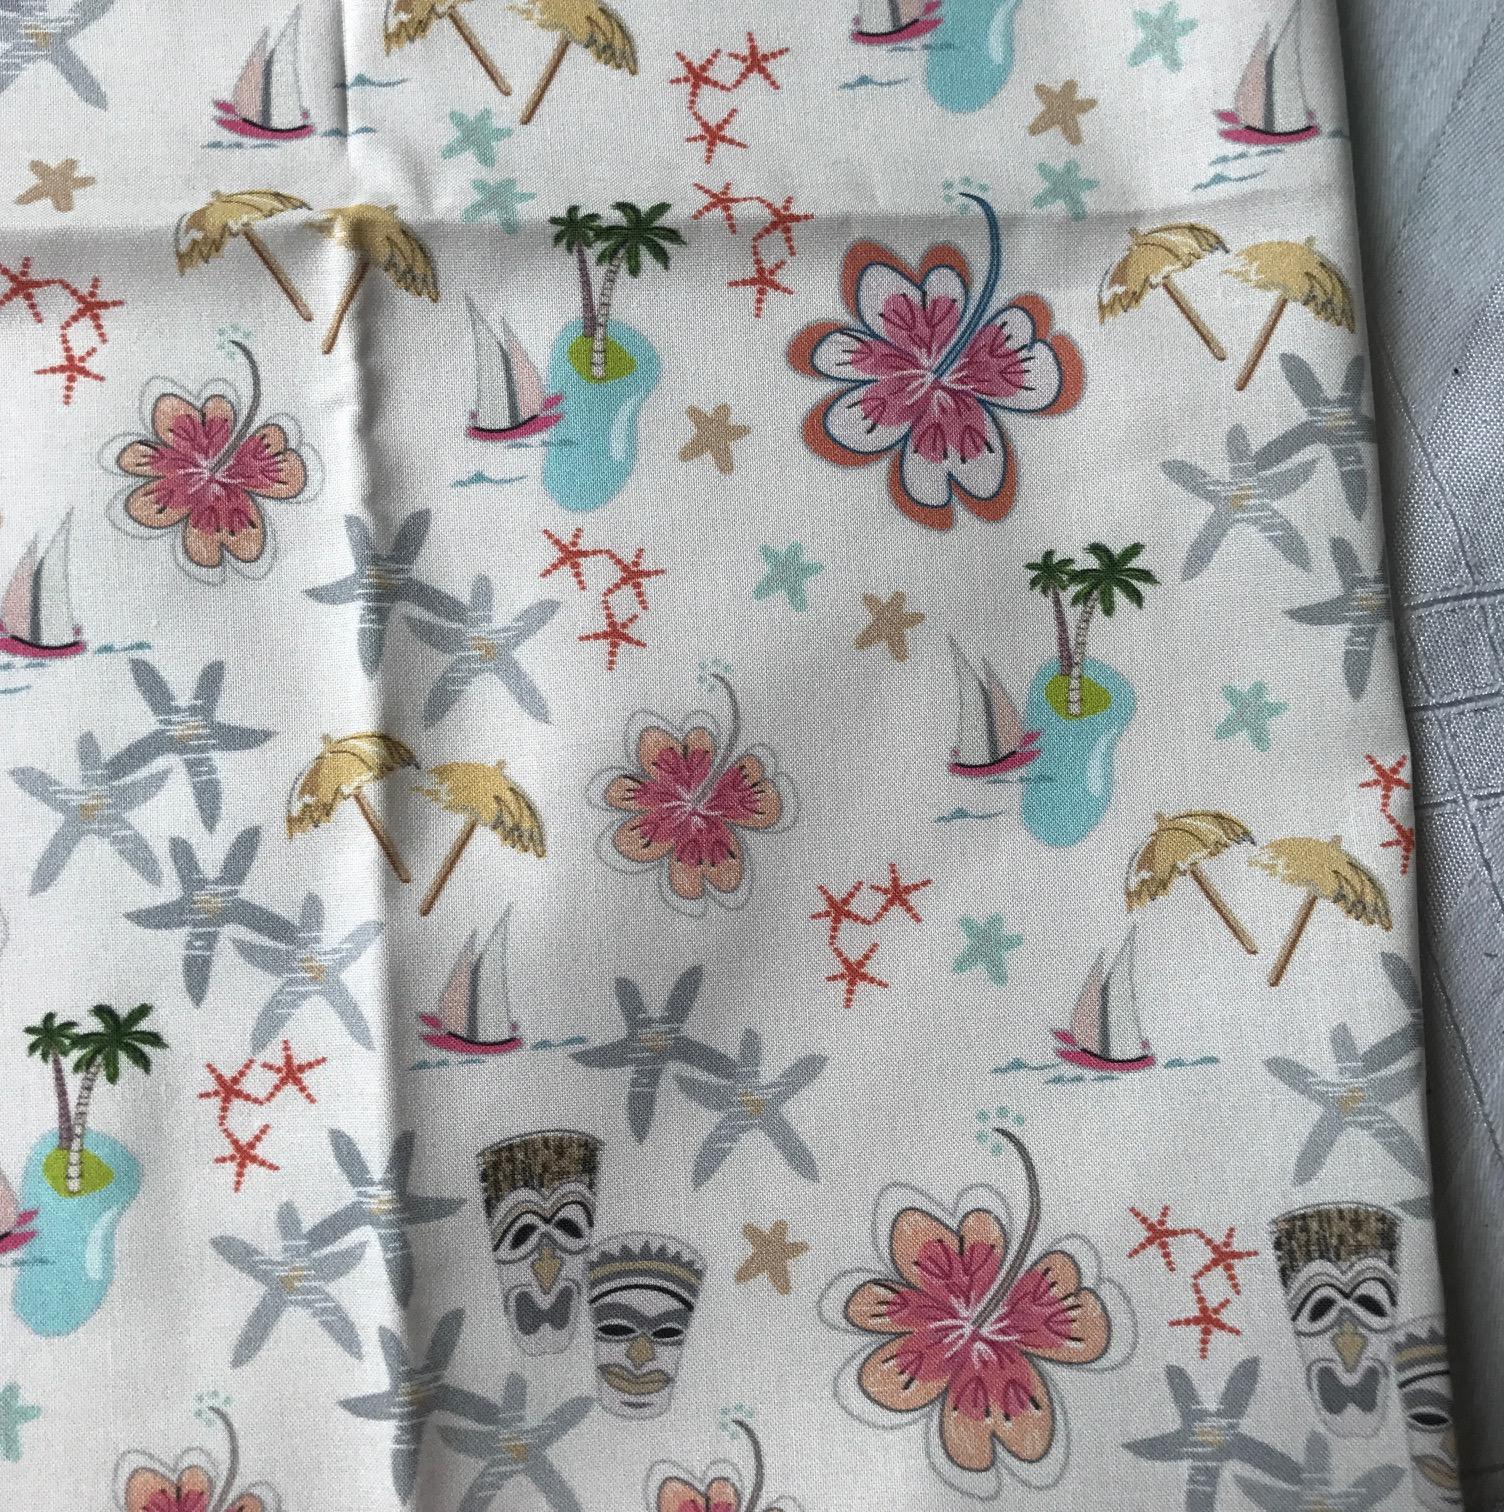 tiki Fabric, sail boat, palm trees, starfish, Hawaiian theme, tiki party, mid-century, tiki illustration, tresa meyer clark, fabric design,